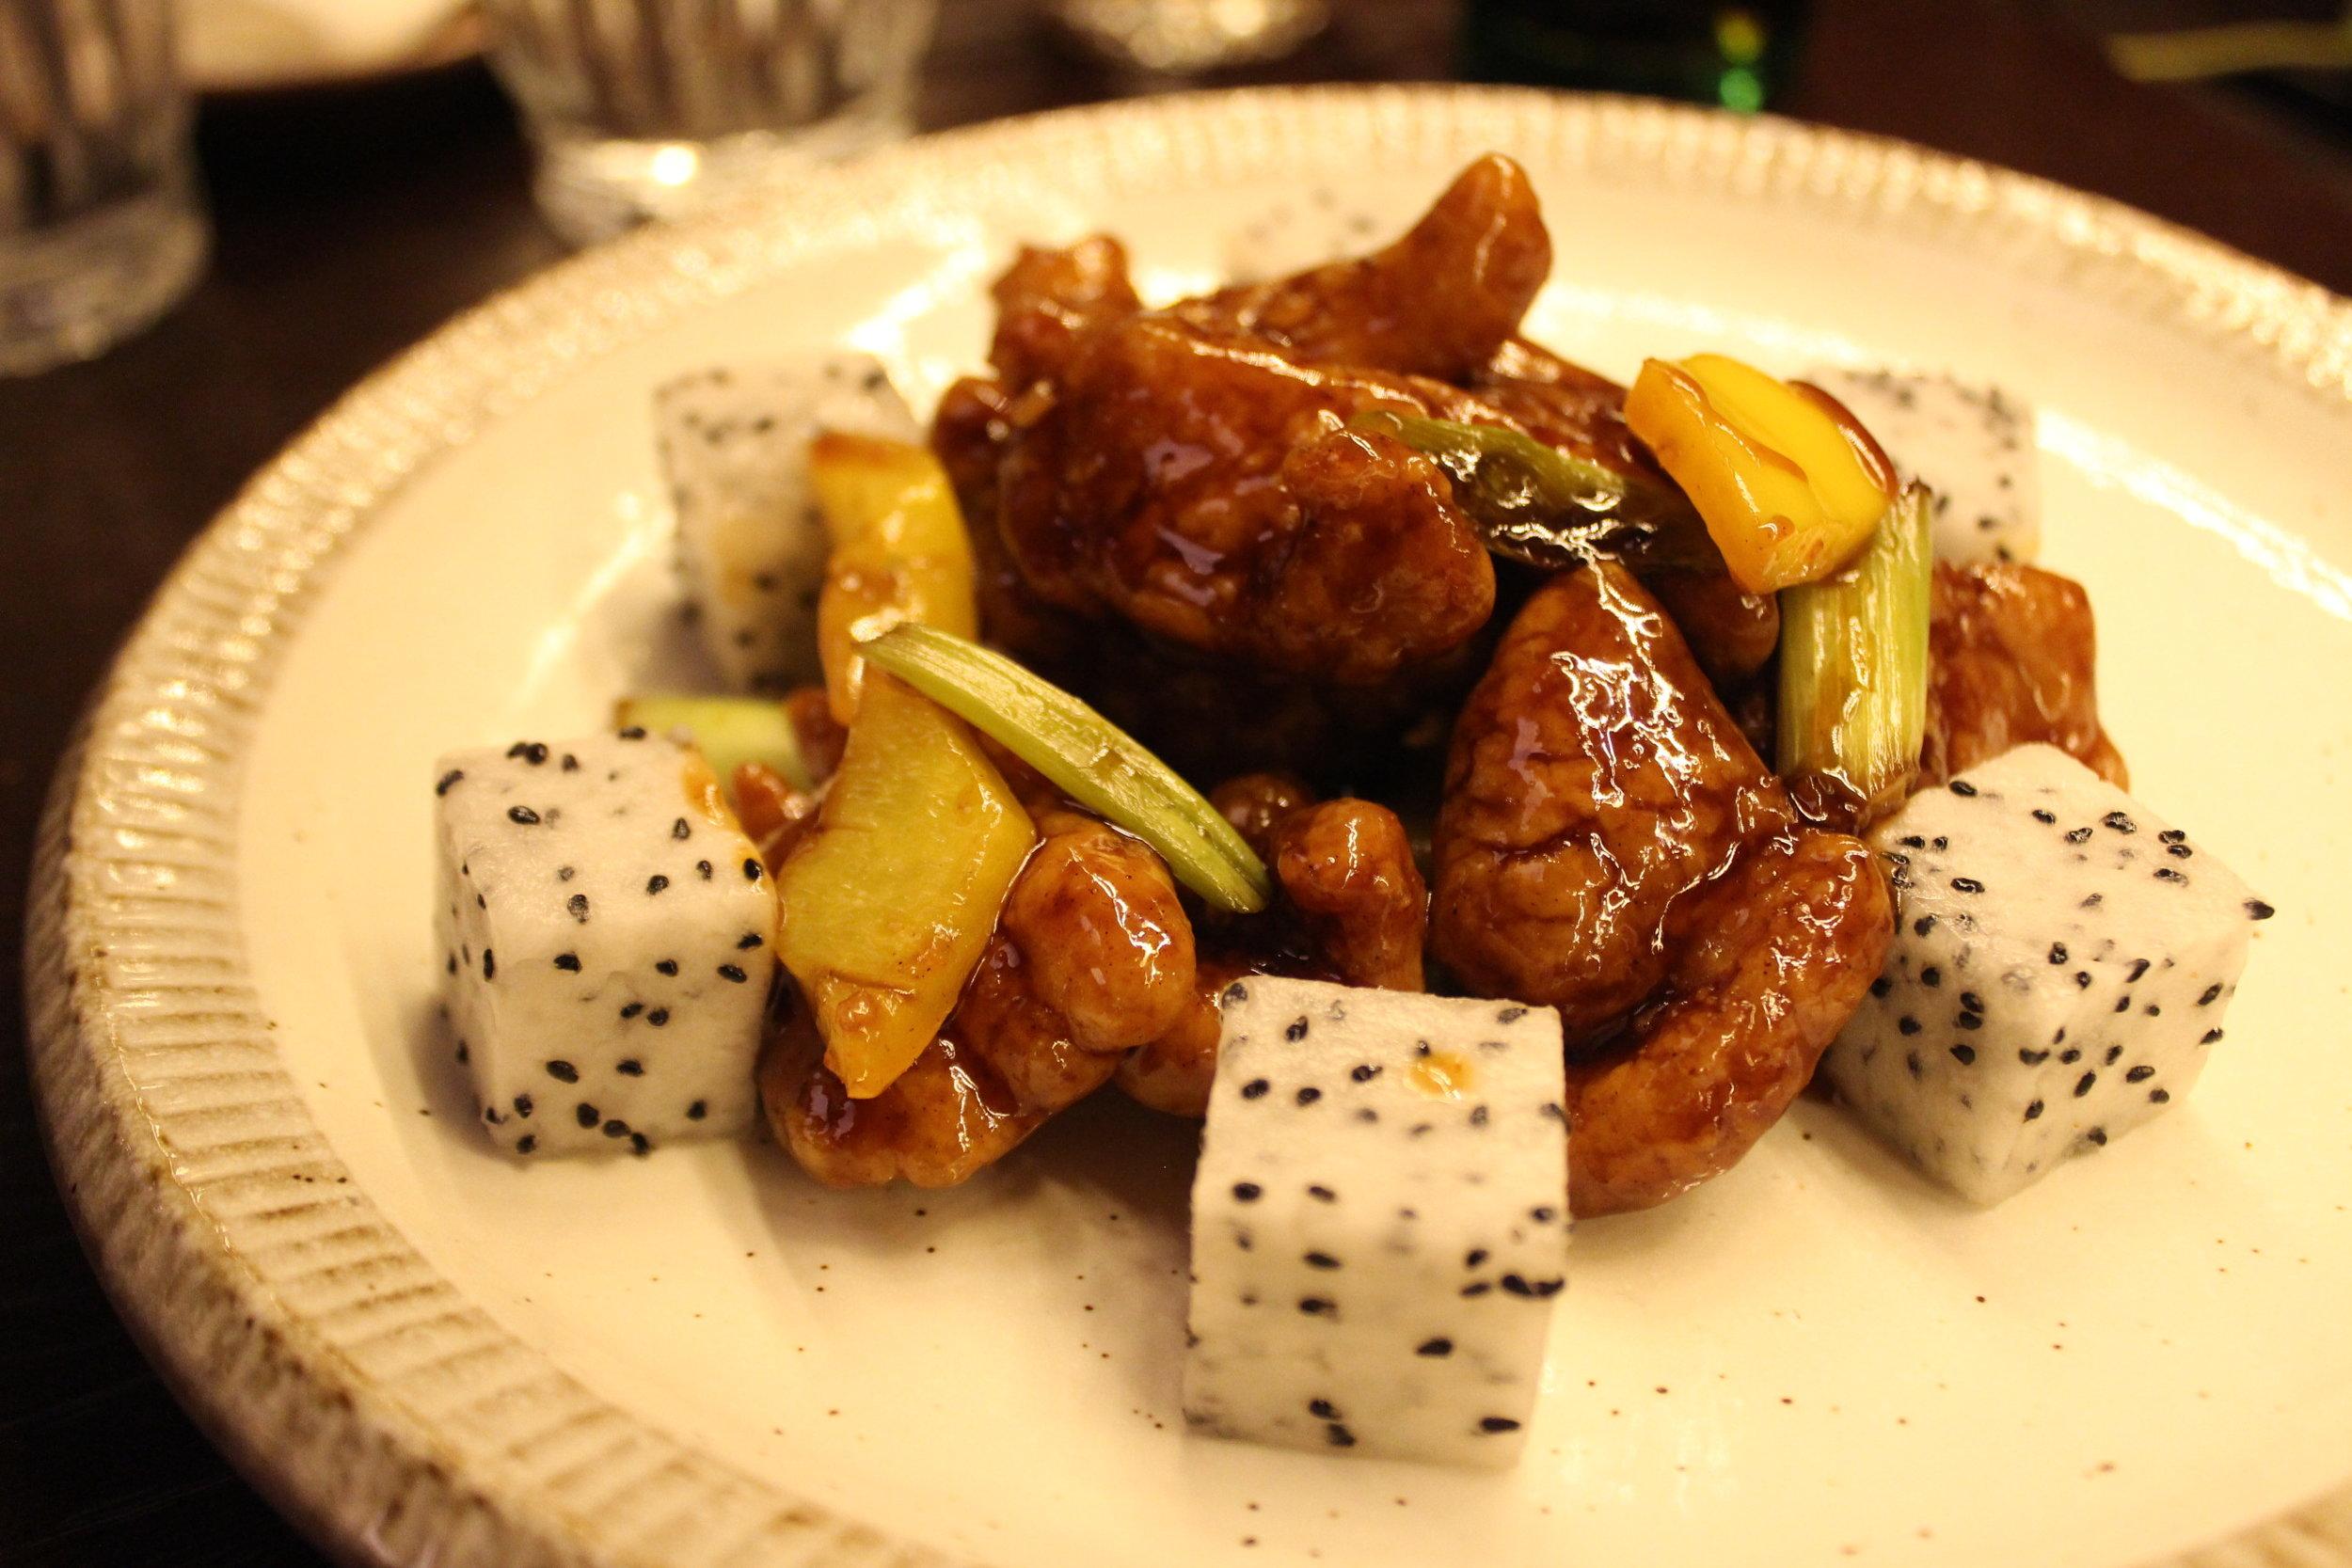 Sweet & Sour Pork, Dragon Fruit, Aged Black Vinegar